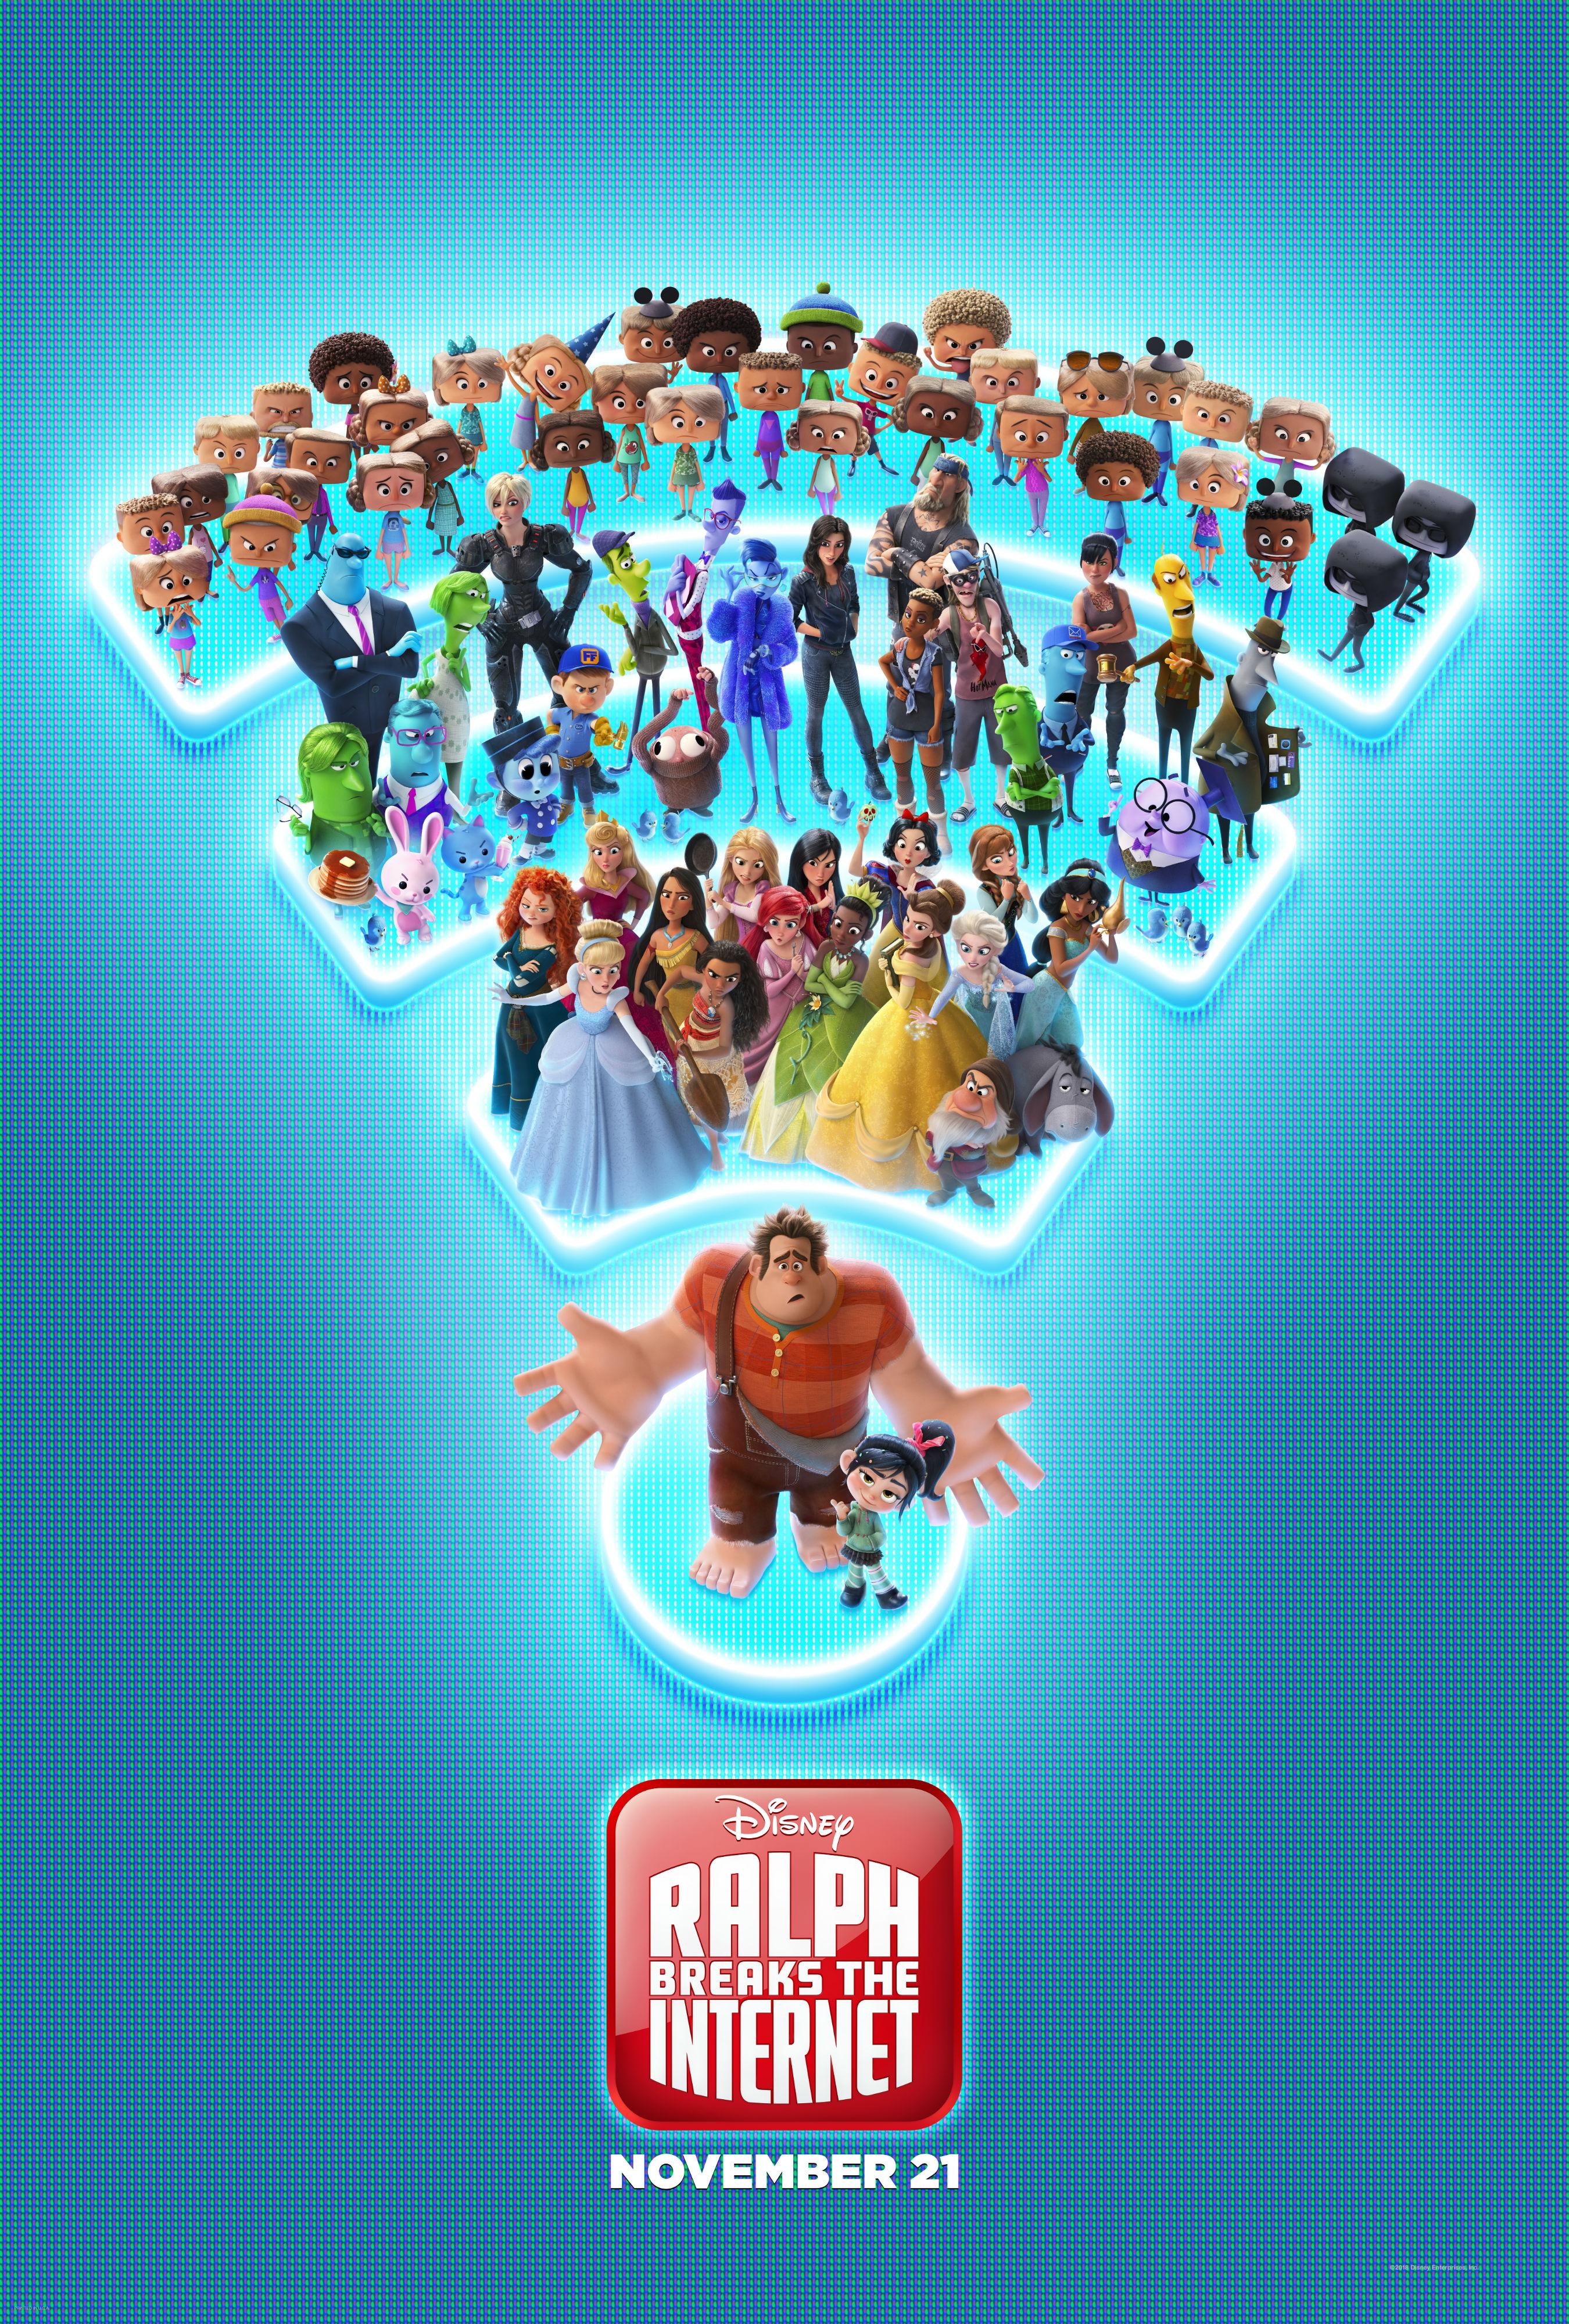 New Trailer & Poster to Ralph Breaks the Internet: Wreck-It Ralph 2 - blackfilm.com/read | blackfilm.com/read